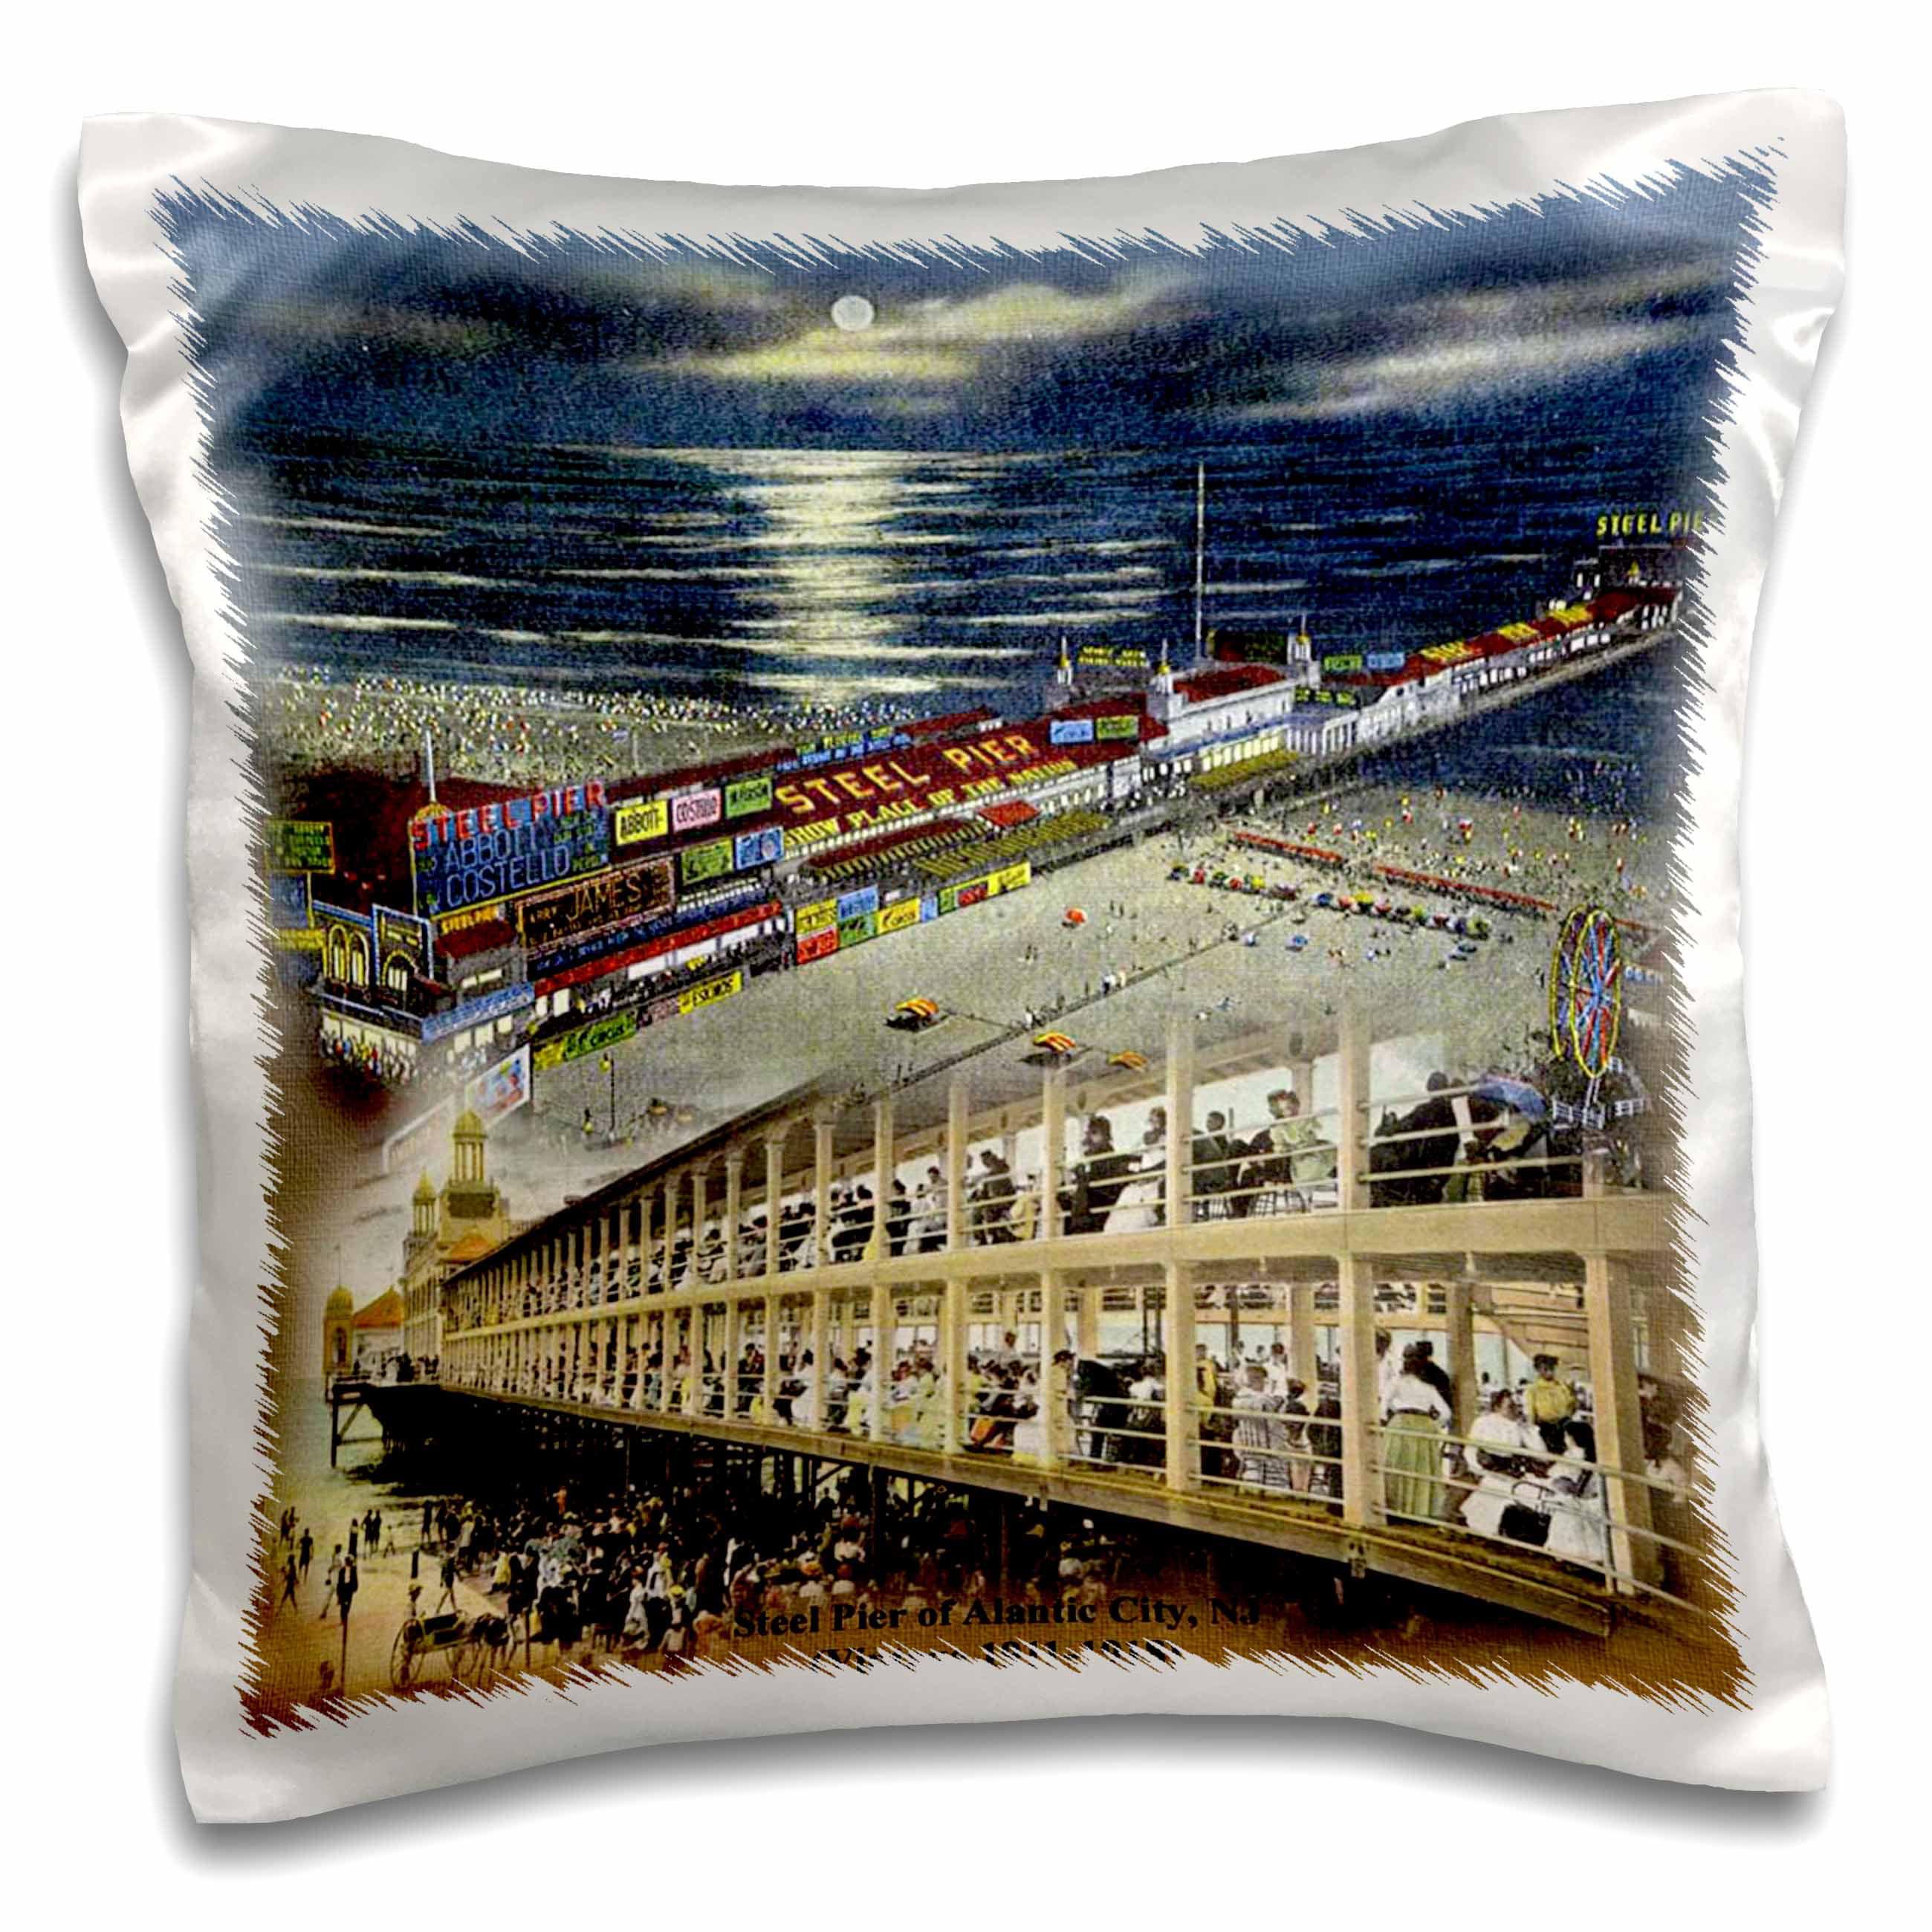 3dRose Steel Pier of Atlantic City, NJ (Vintage 1911-1918), Pillow Case, 16 by 16-inch